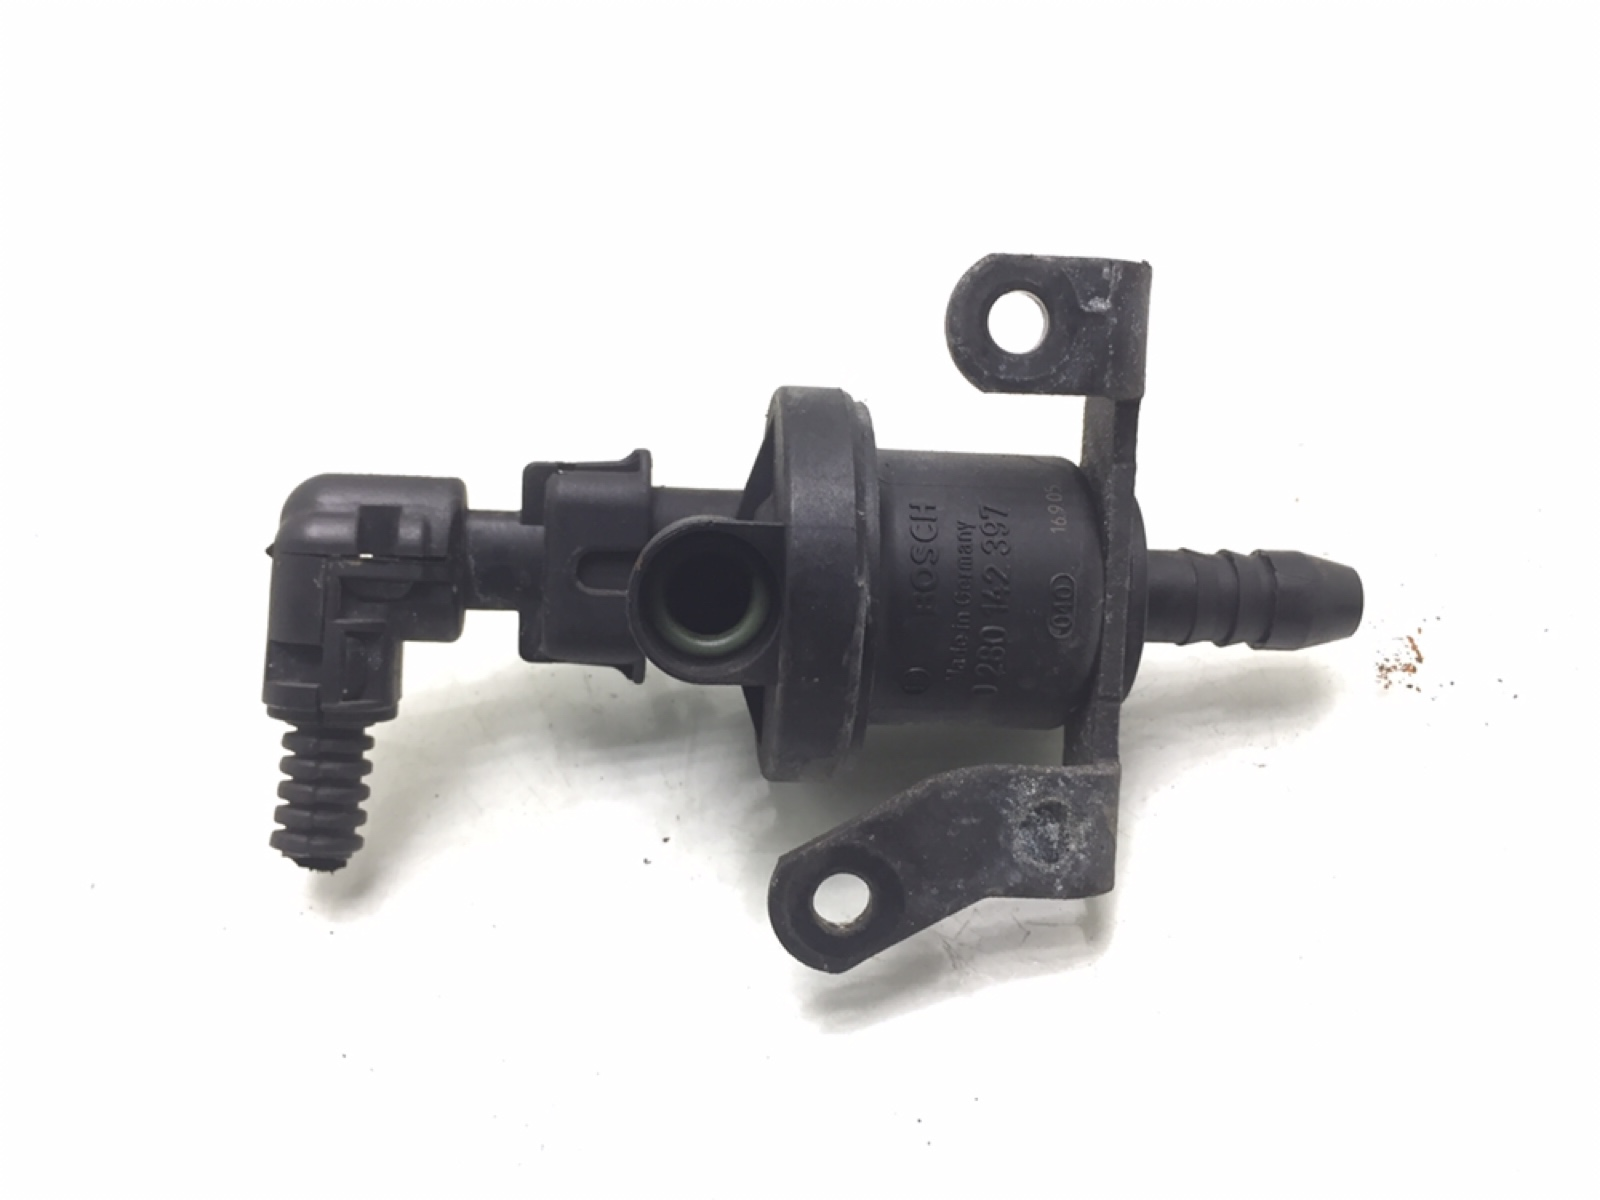 Клапан вентиляции топливного бака Opel Corsa C 1.4 I 2006 (б/у)